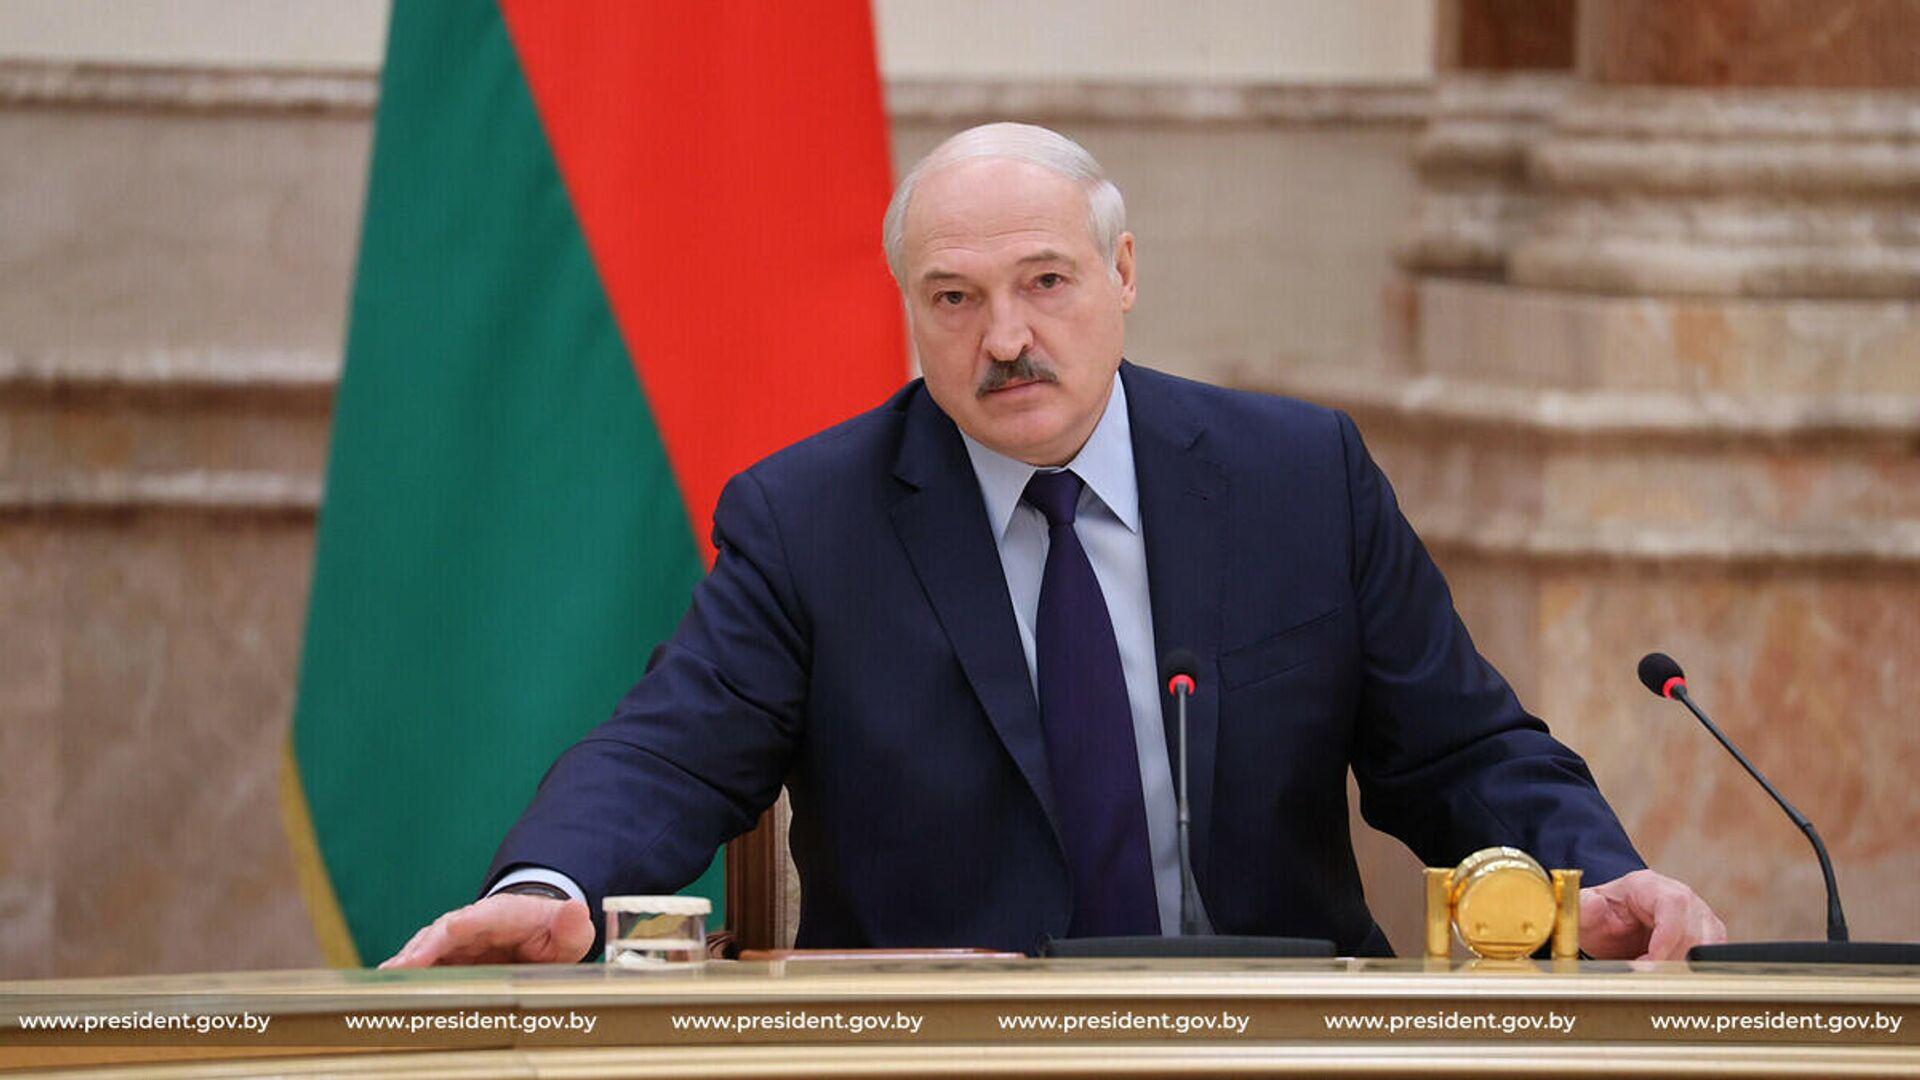 Президент Беларуси Александр Лукашенко - Sputnik Беларусь, 1920, 01.10.2021